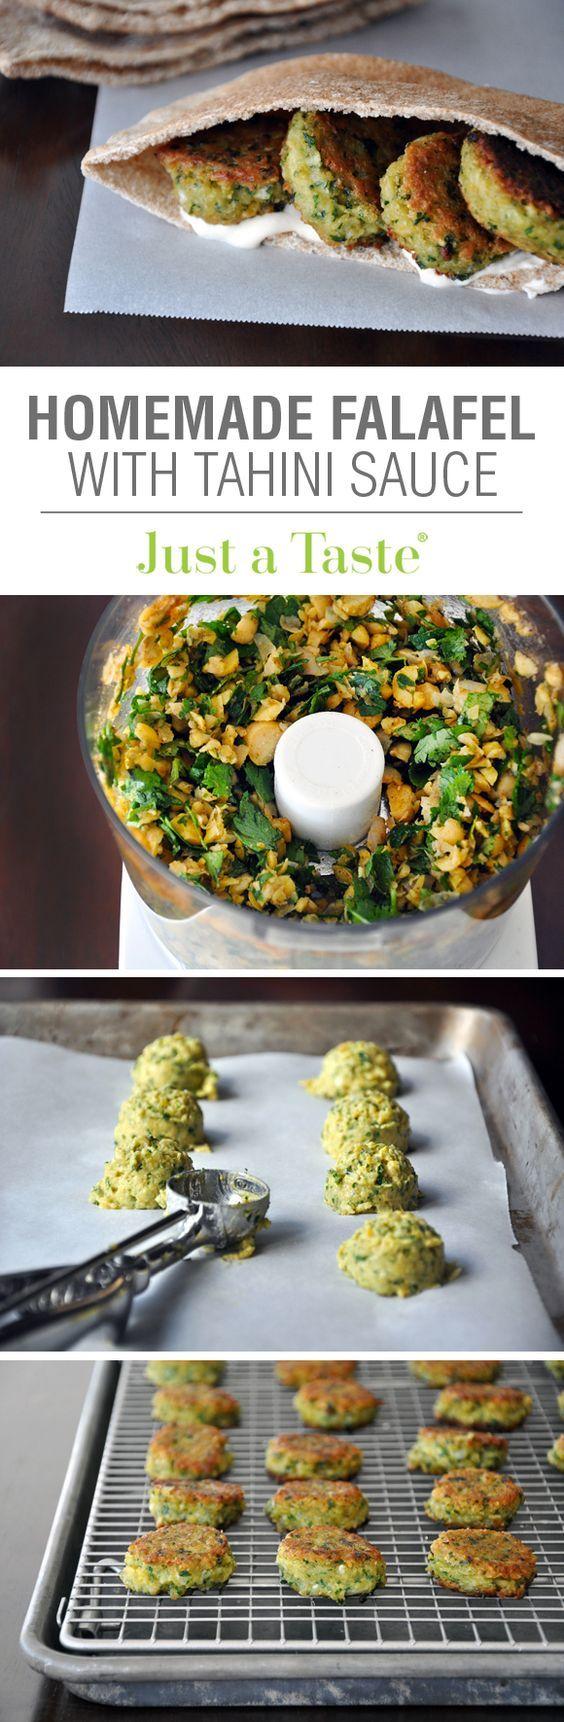 Homemade Falafel with Tahini SauceHomemade Falafel with Tahini Sauce